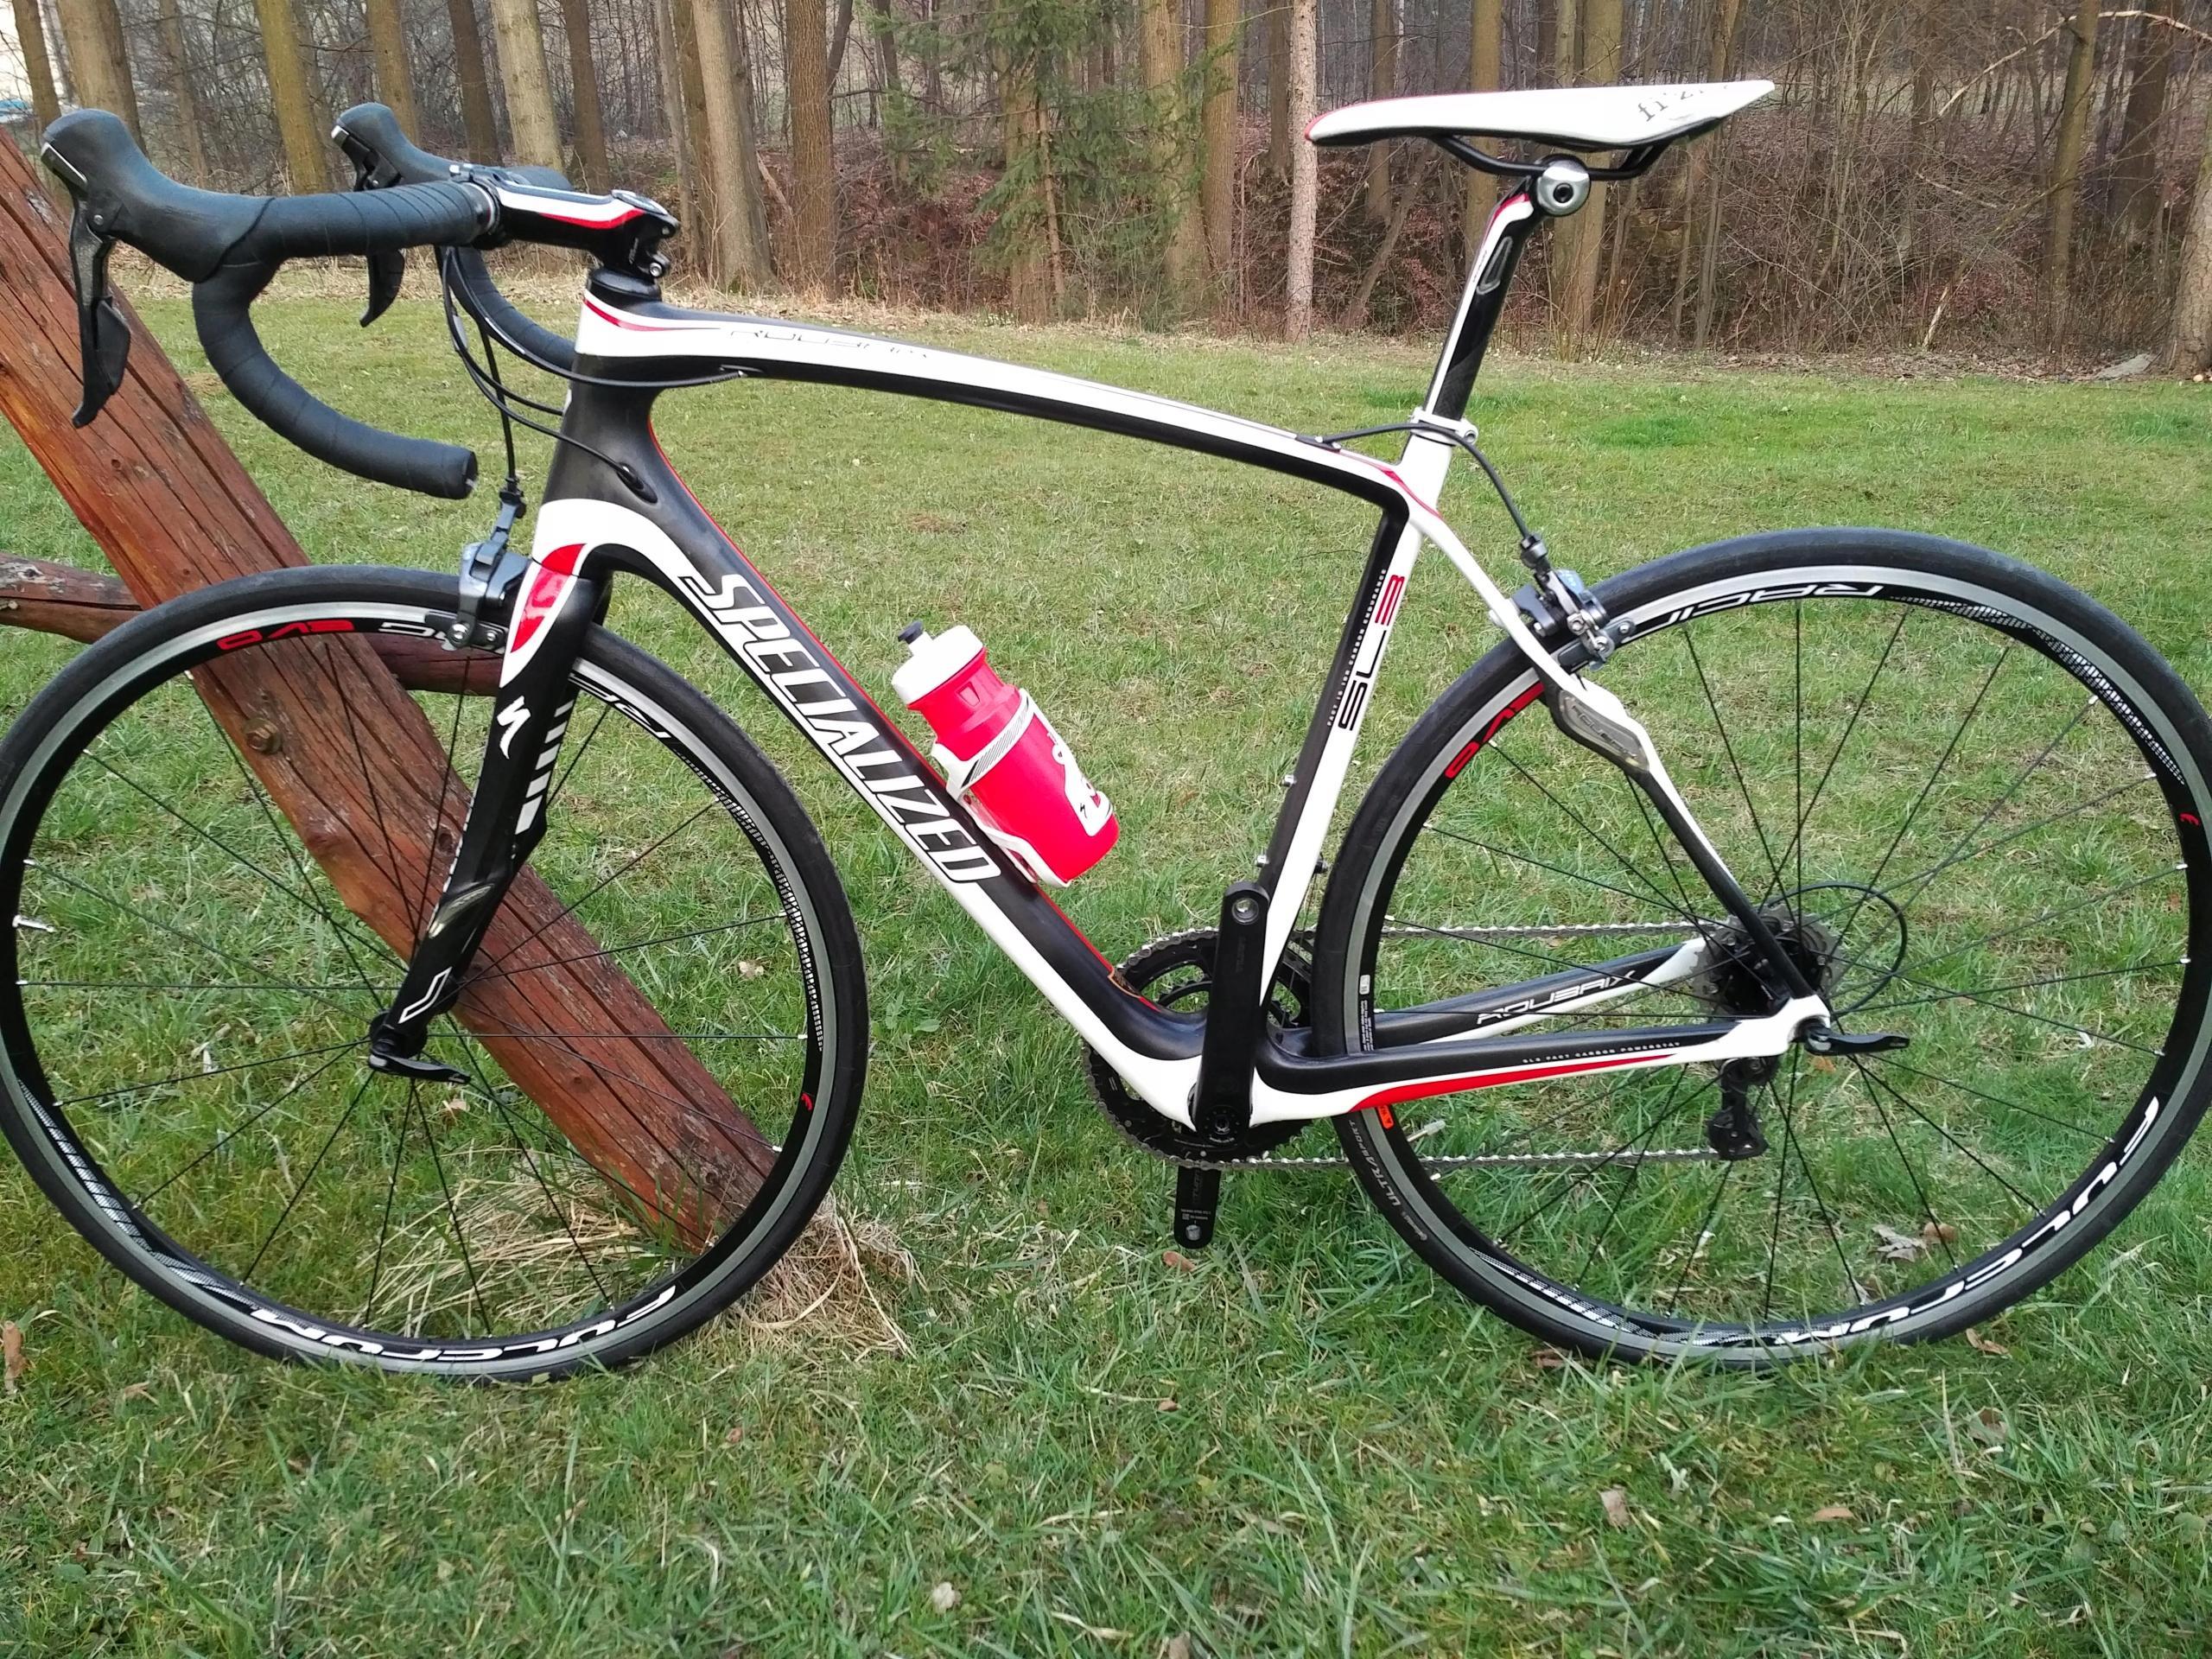 Specialized Roubaix Pro, Ultegra 6800 11s, Fulcrum